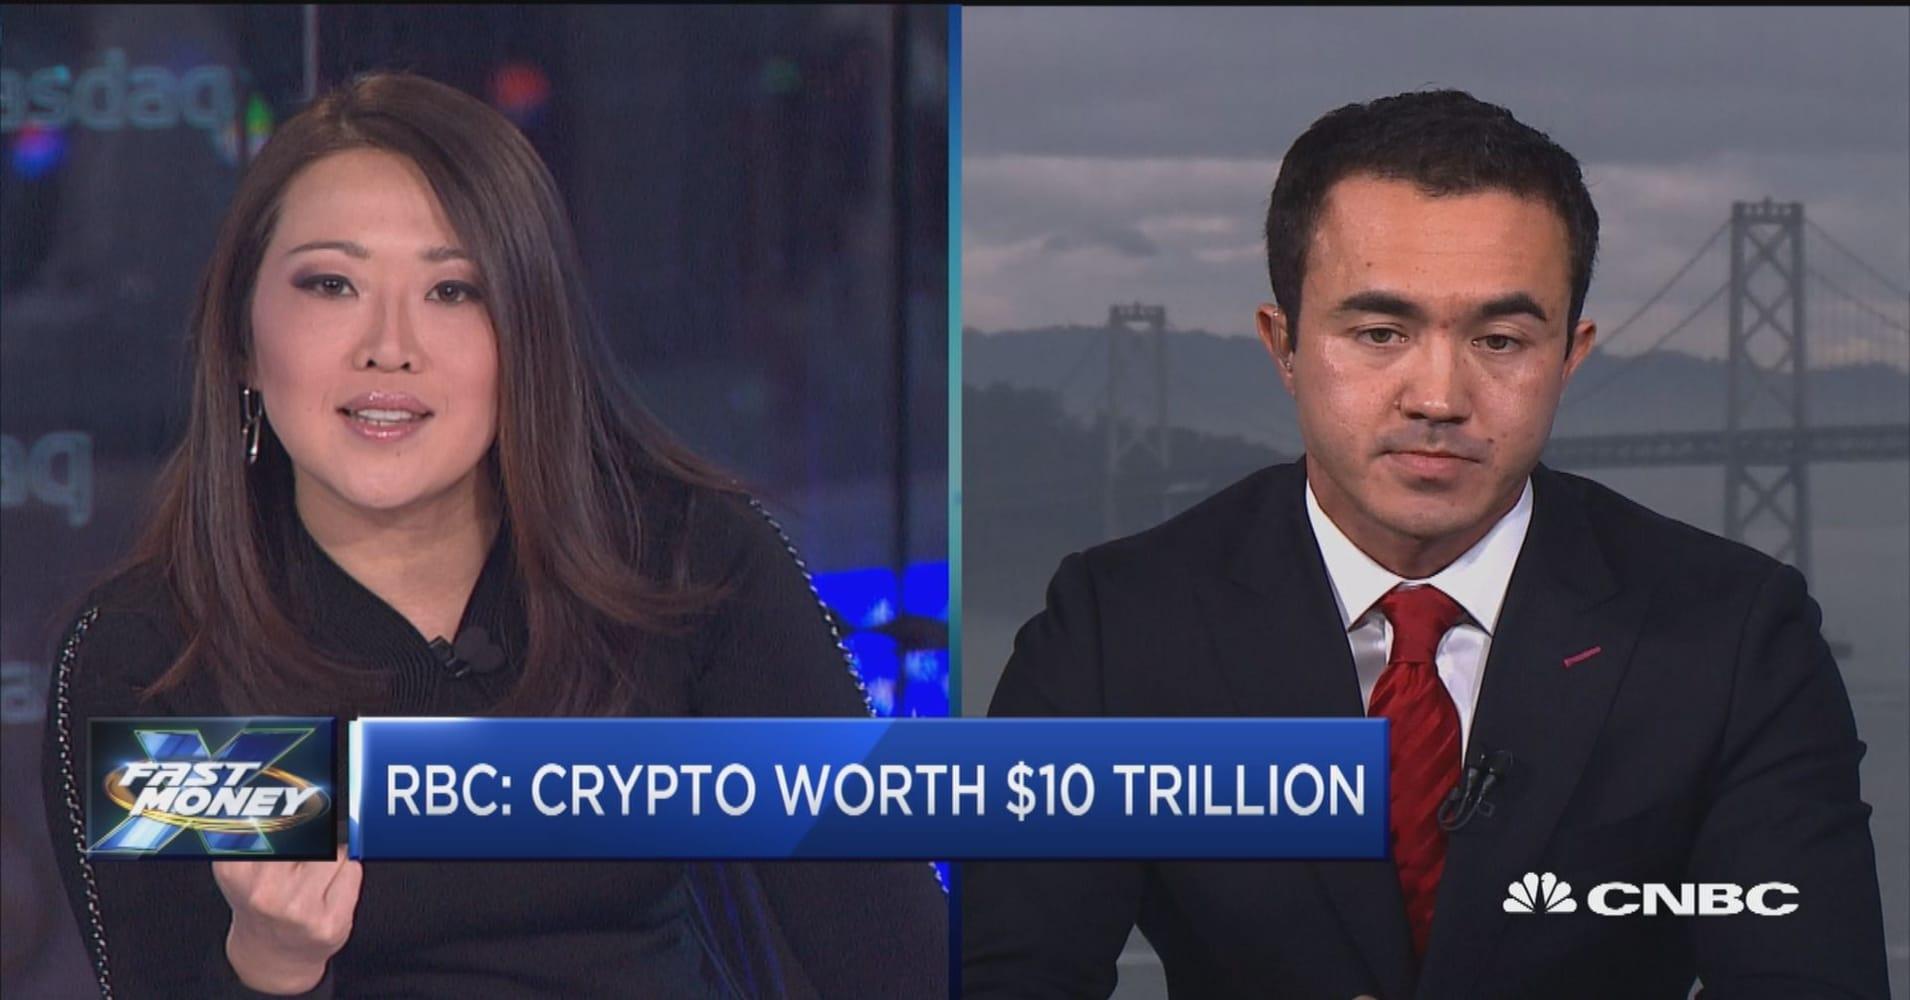 The $10 trillion dollar bull case for cryptocurrecies